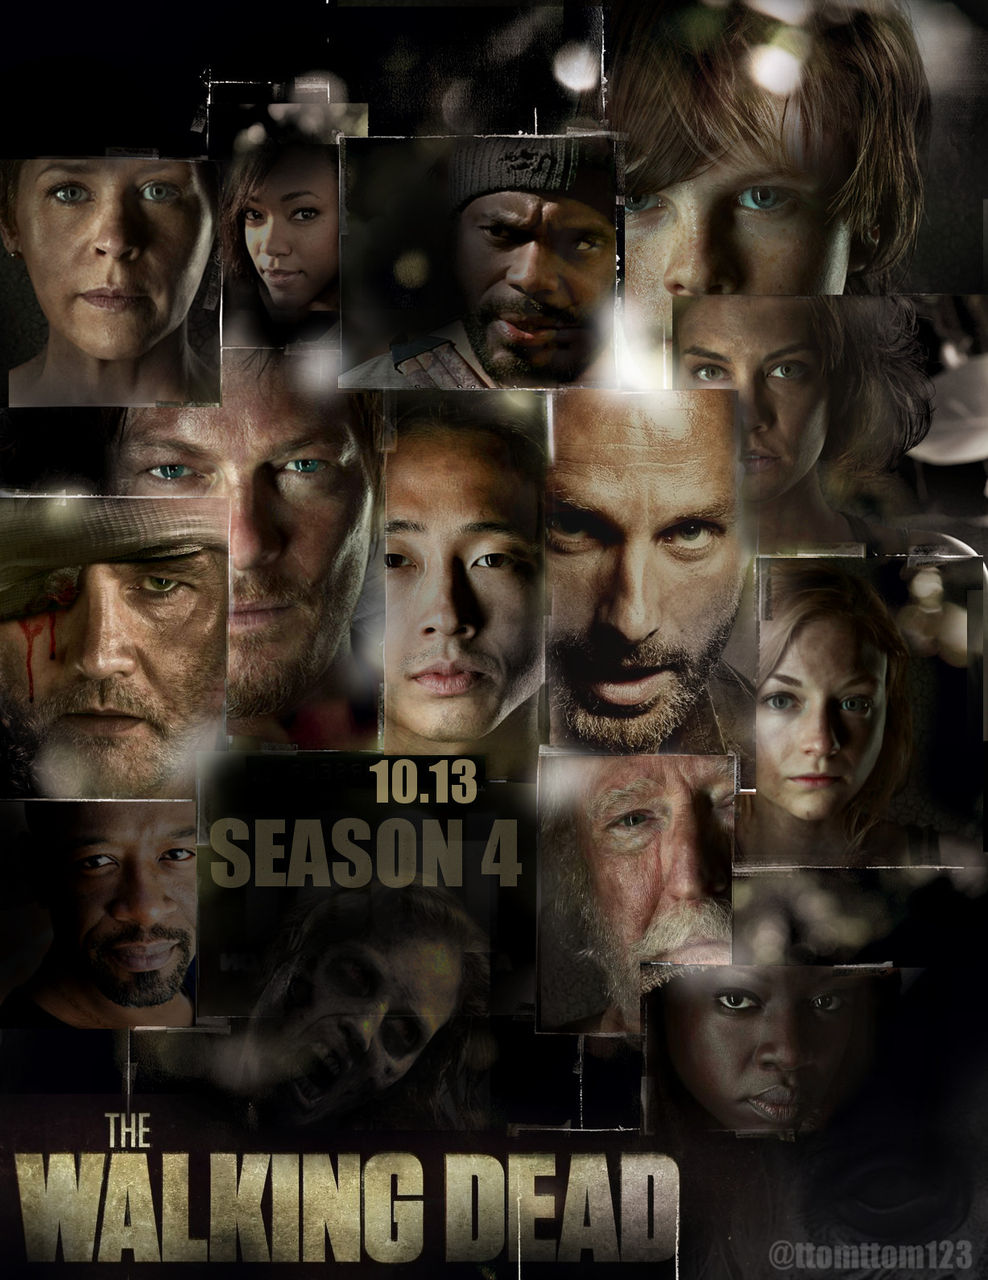 42 the walking dead season 4 the walking dead voltagebd Choice Image